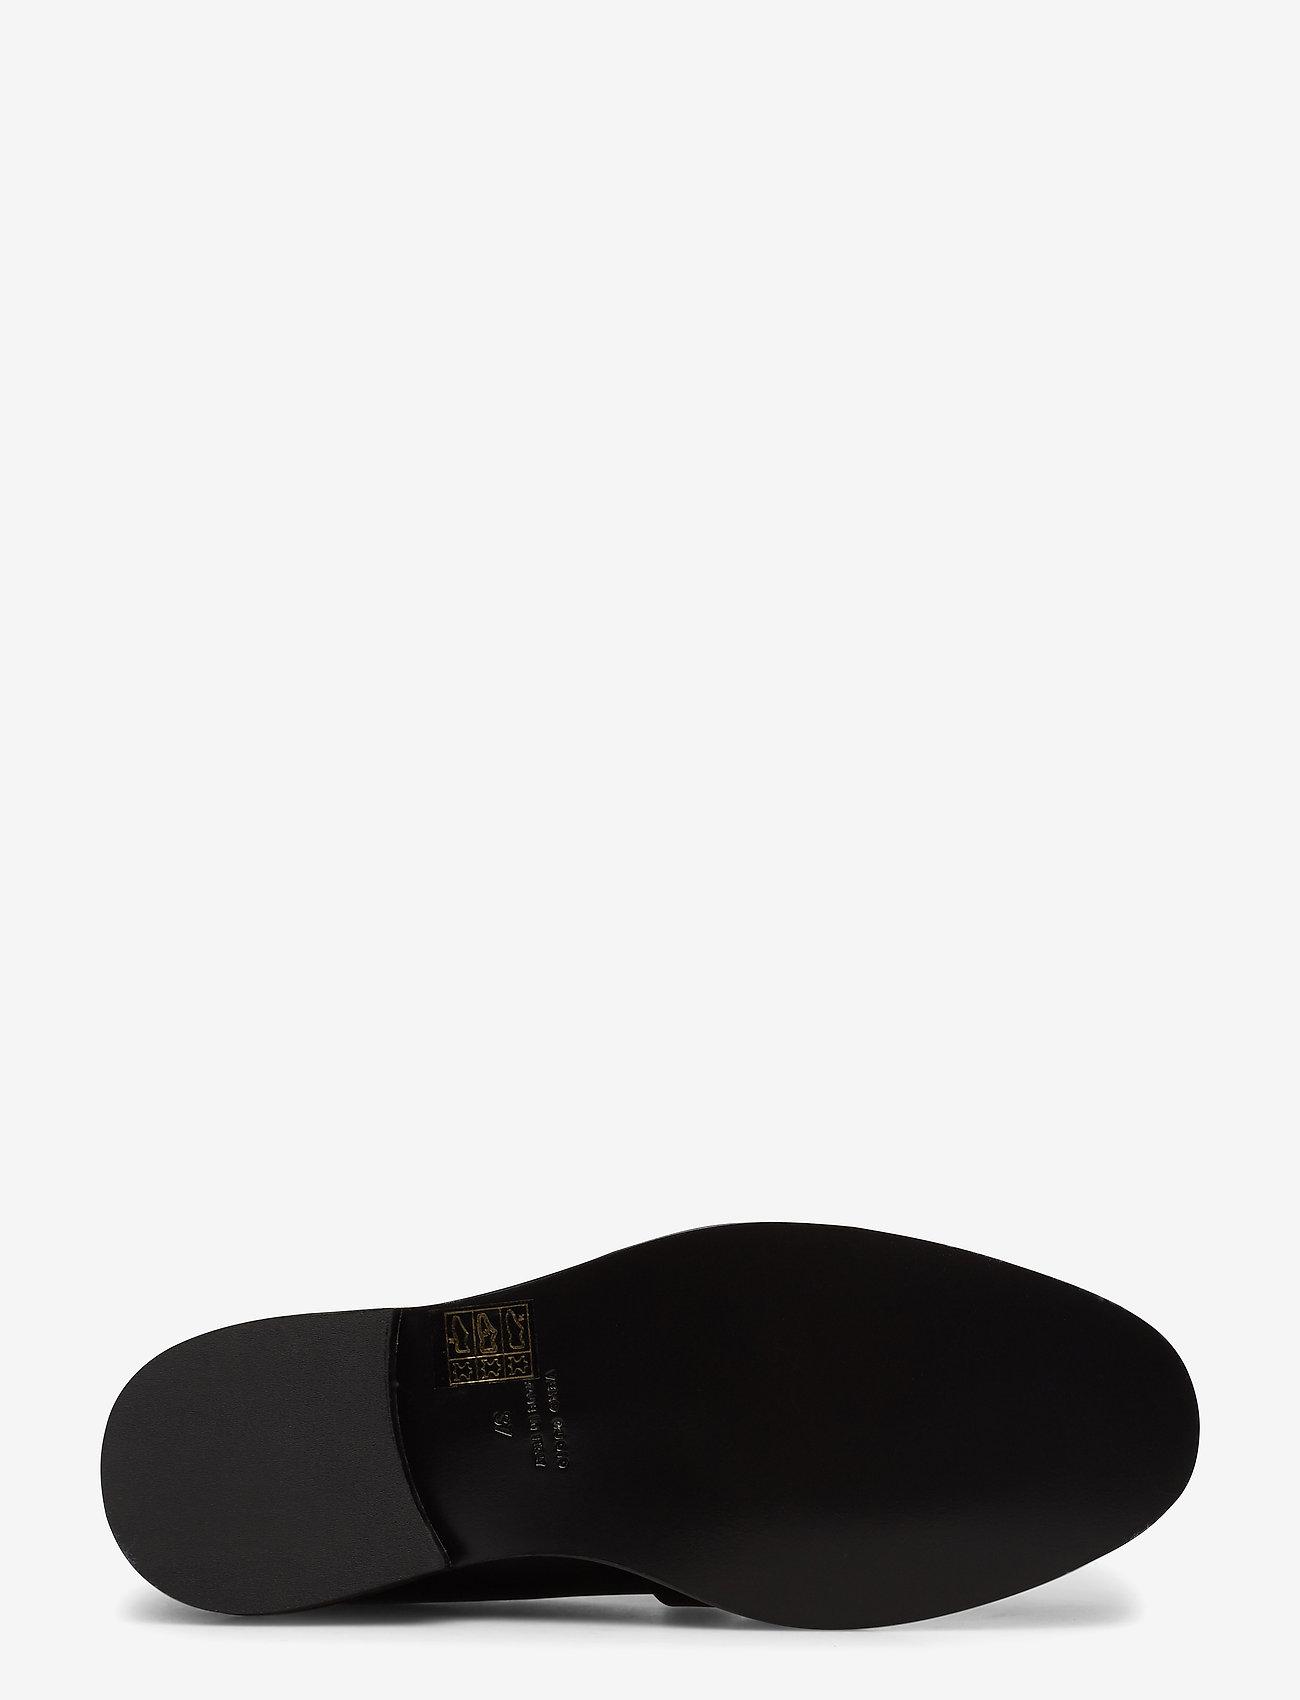 Marittima Vacchetta (Black) (3000 kr) - ATP Atelier